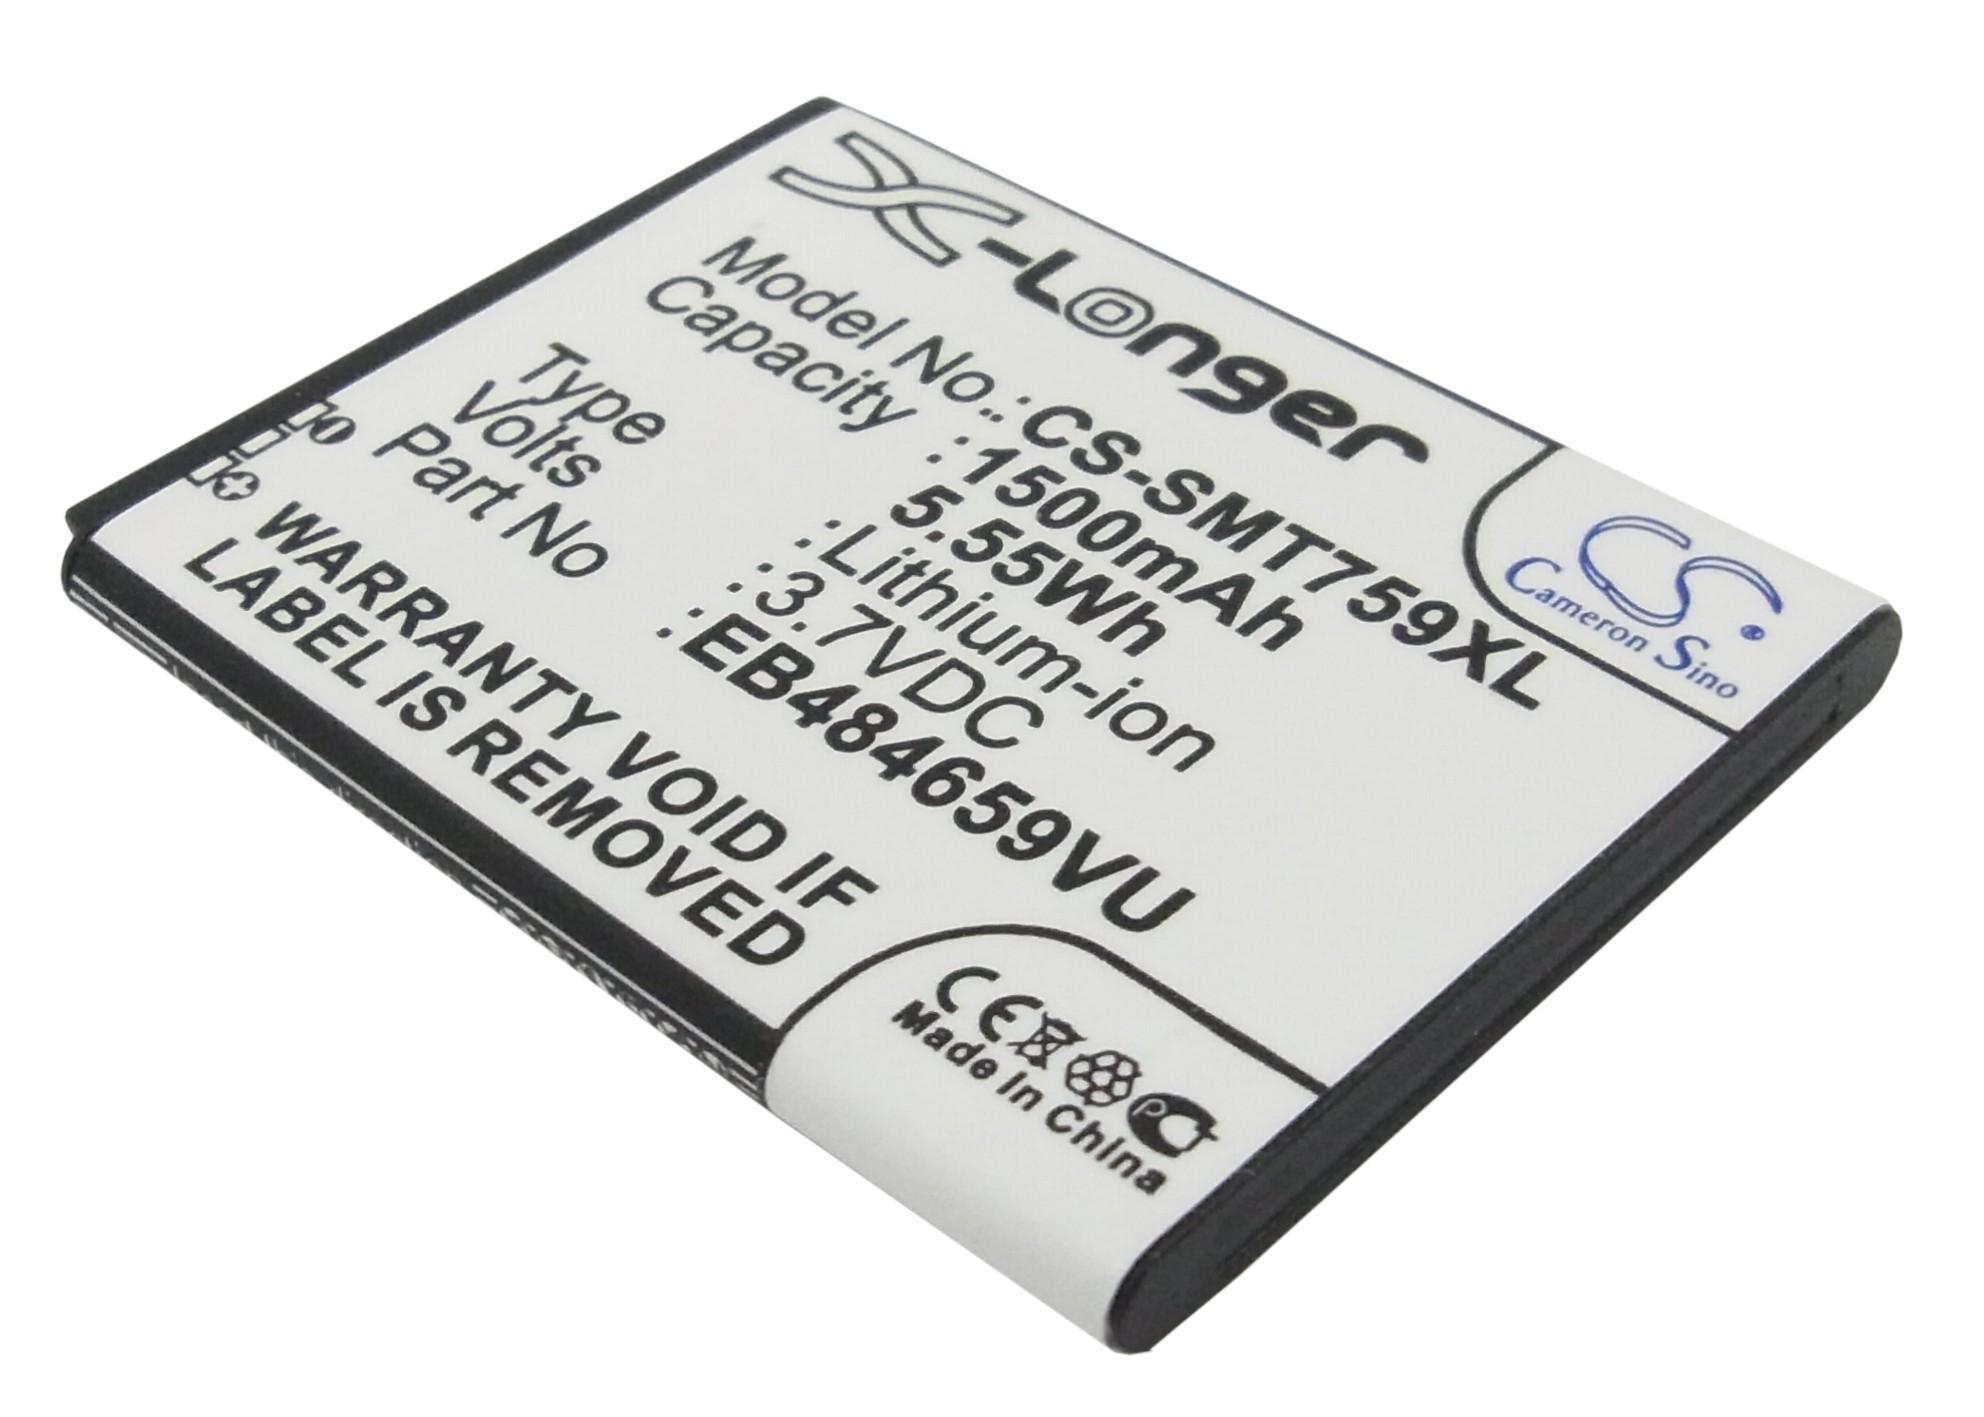 Cameron Sino baterie do mobilů pro SAMSUNG SPH-D600 3.7V Li-ion 1500mAh černá - neoriginální